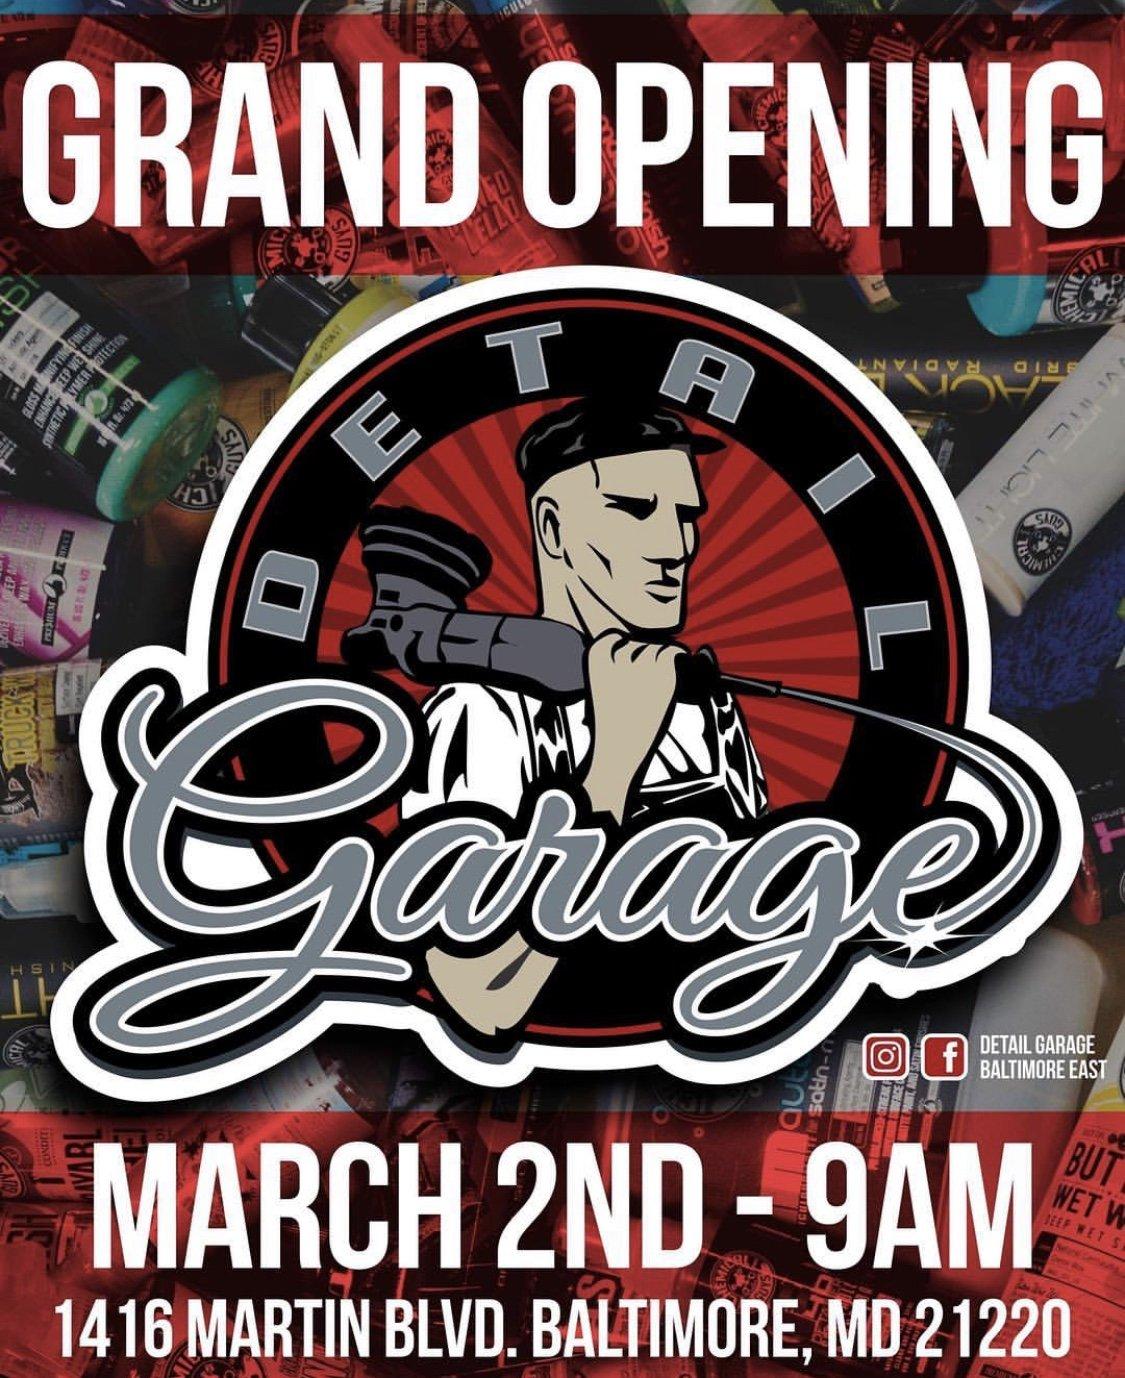 Detail Garage Baltimore East Open House 2-11-19.jpg